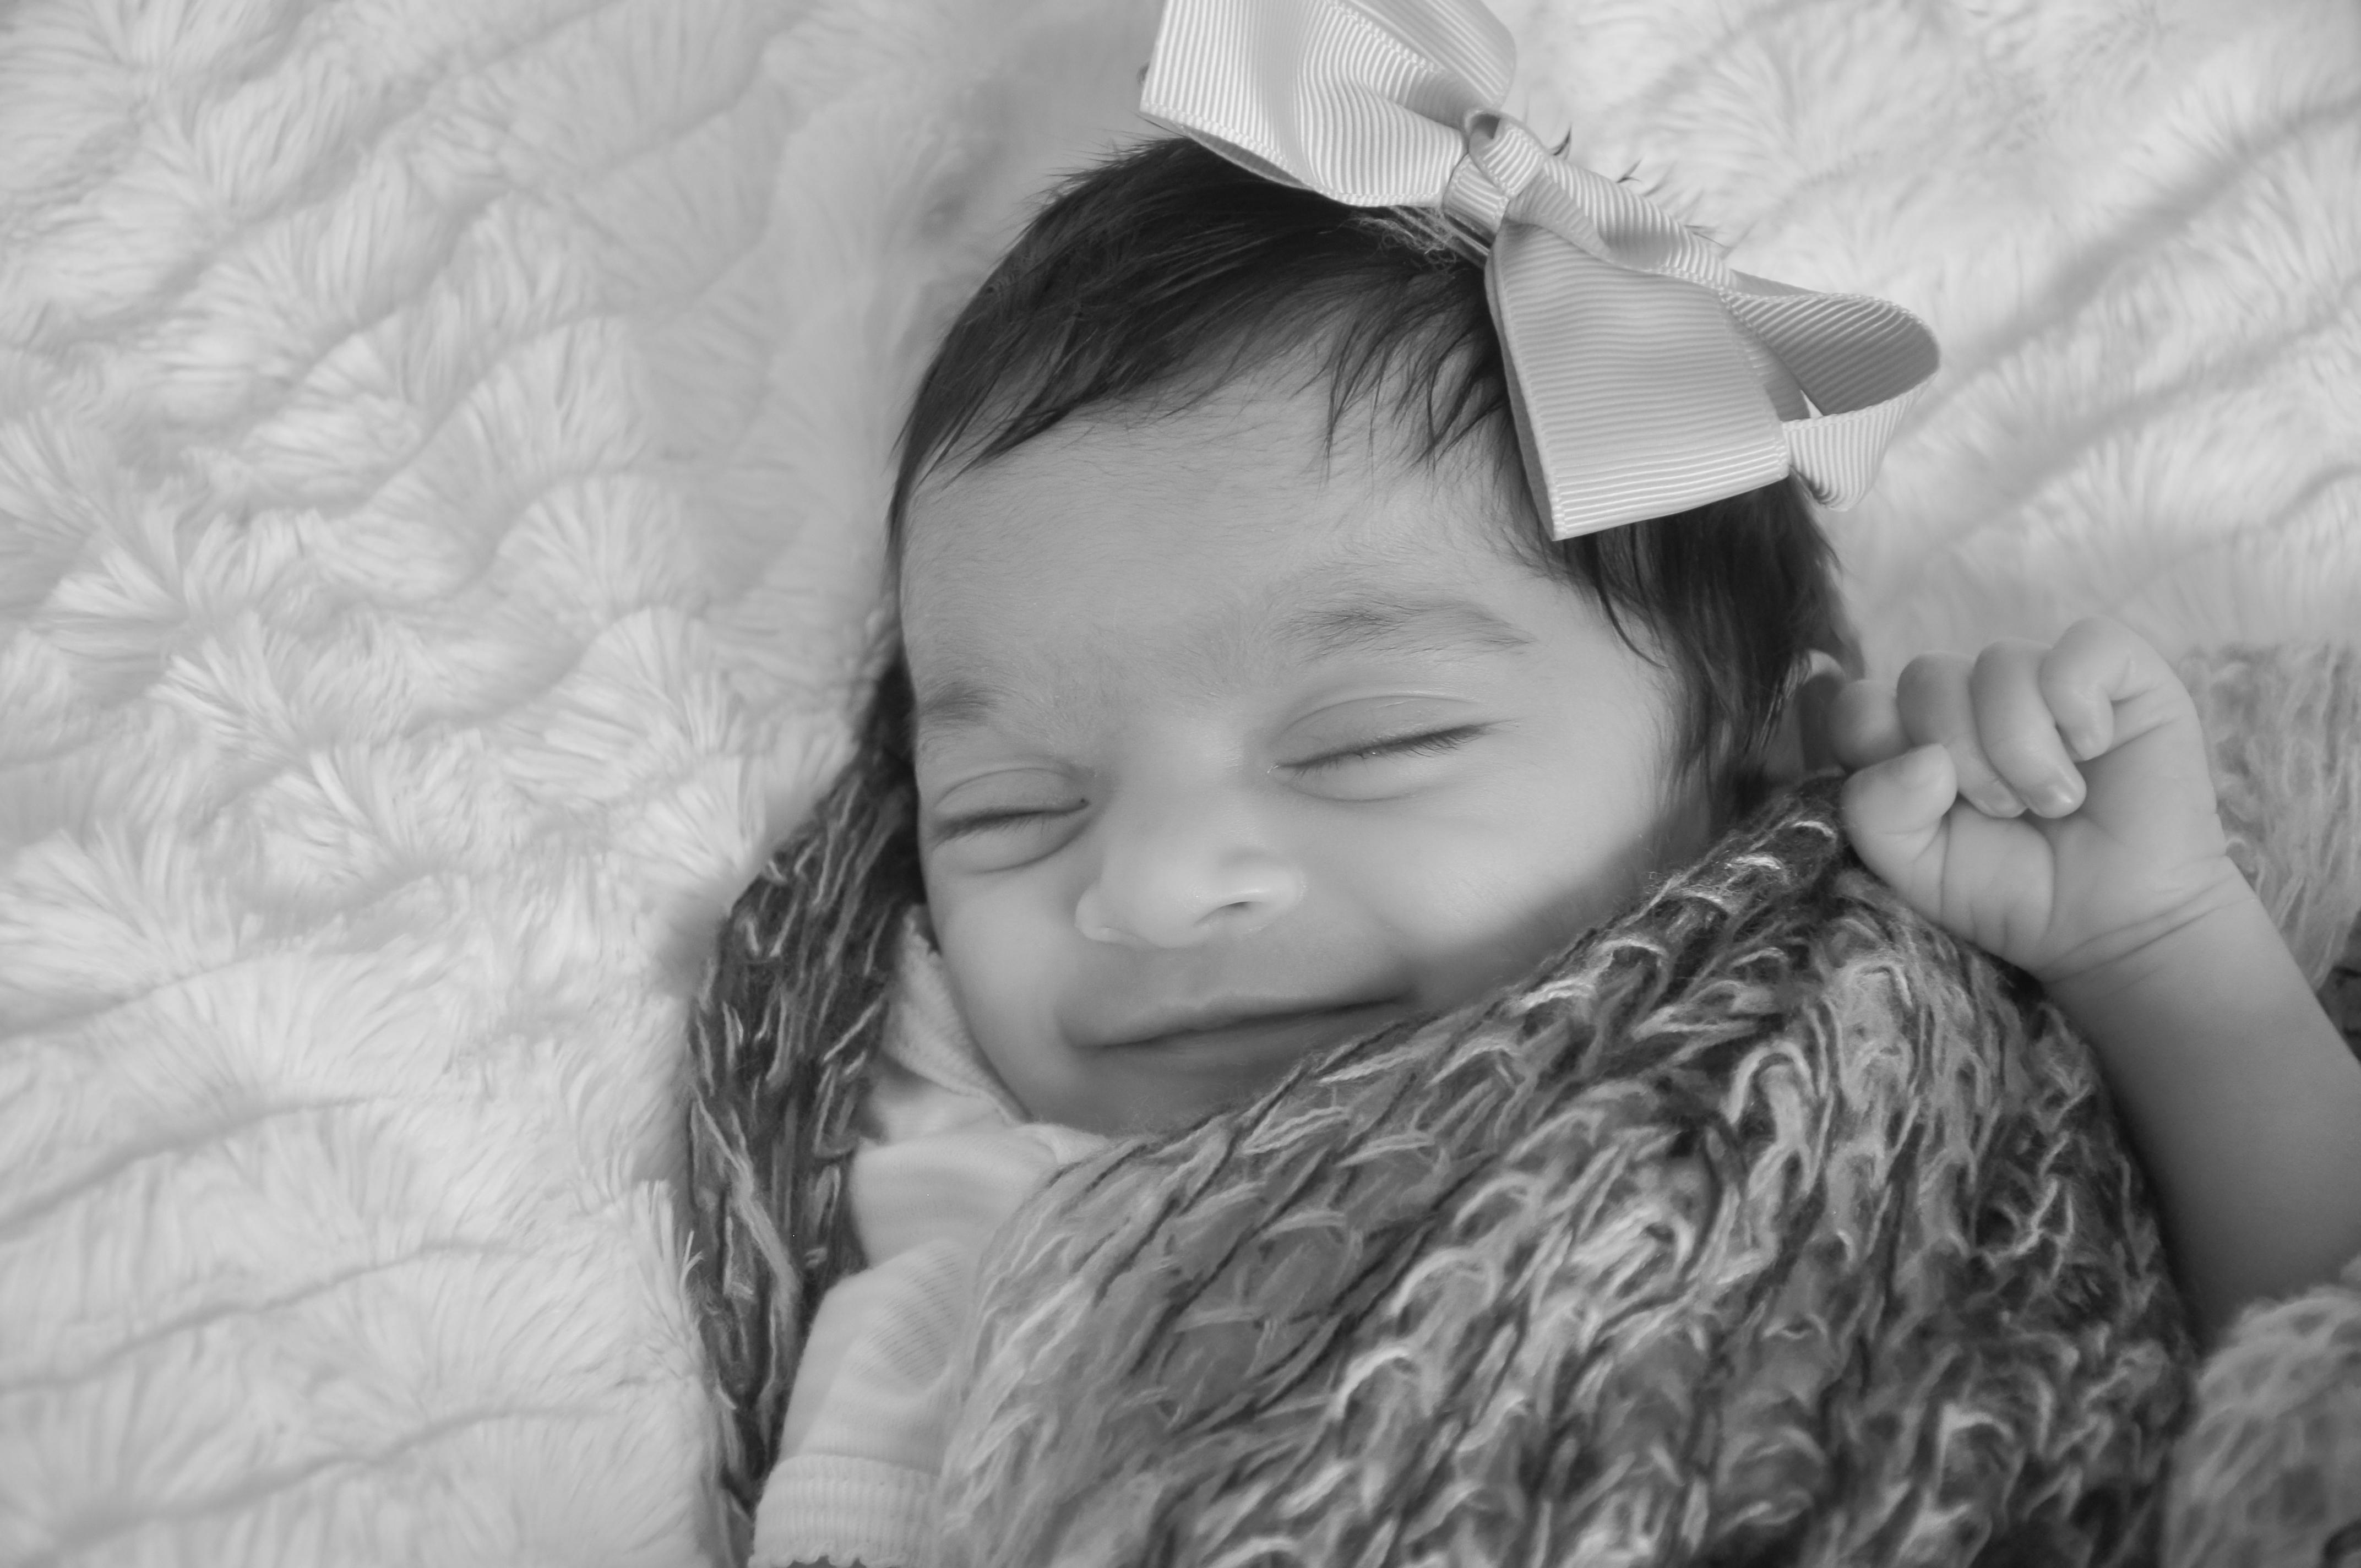 Shruttigarg_newborn hptography-1